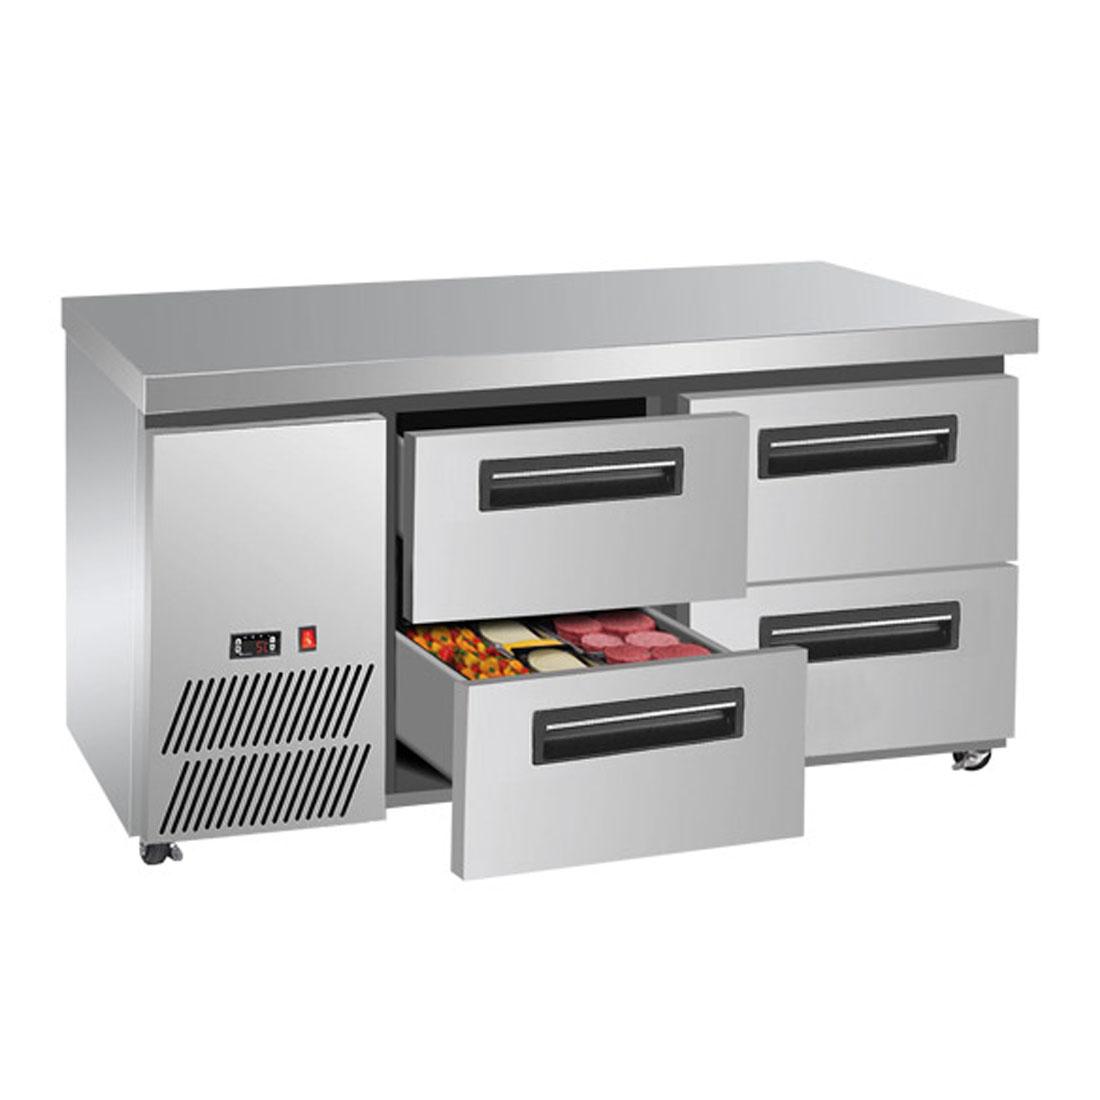 LBC125 Four drawer Lowboy Fridge